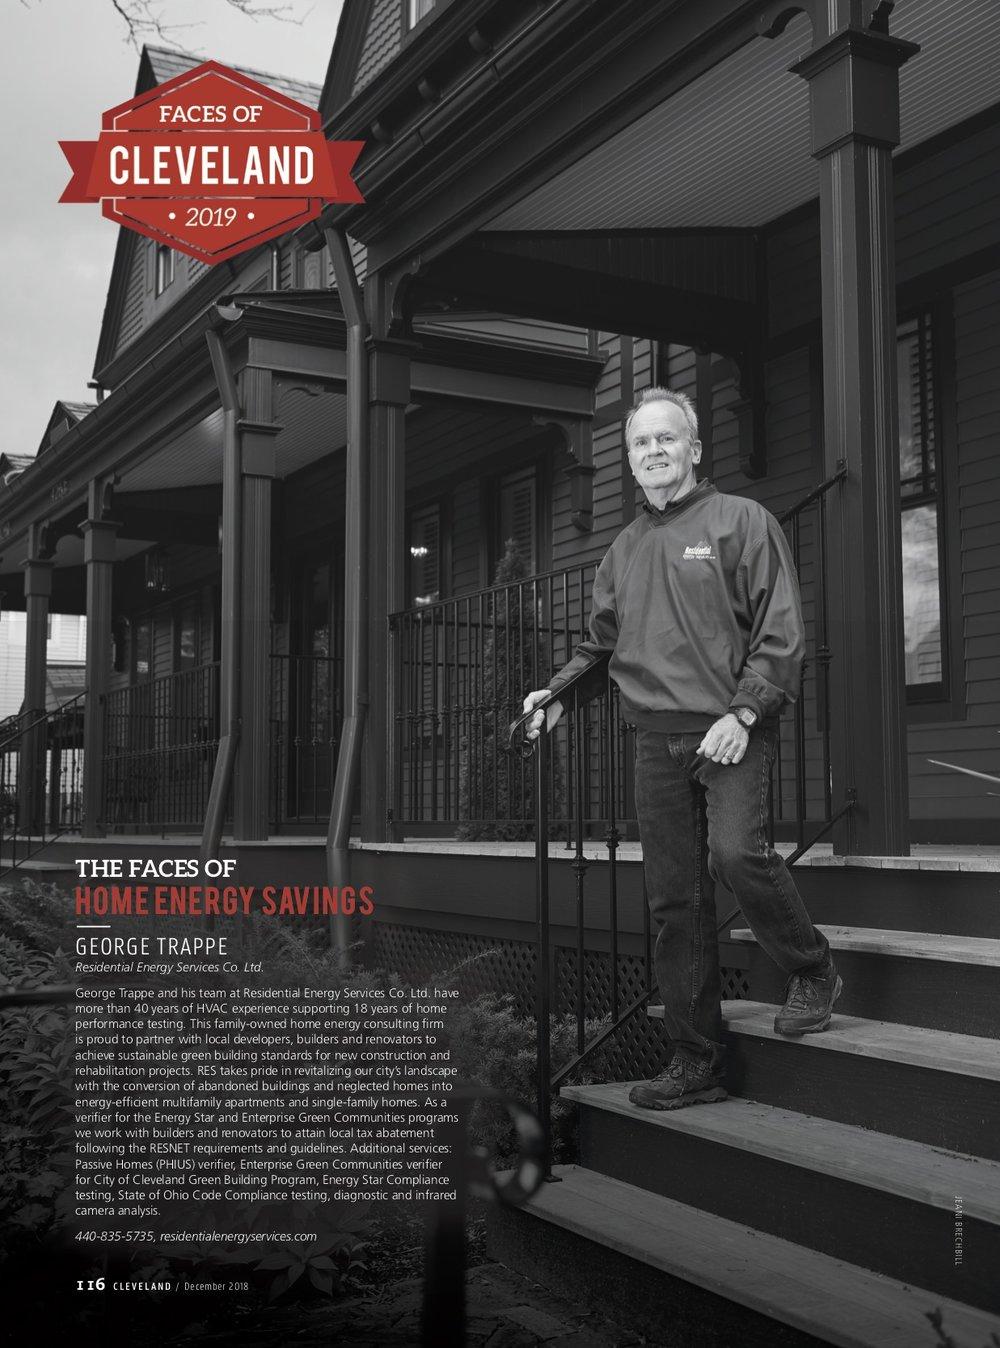 Cleveland Magazine, December 2016